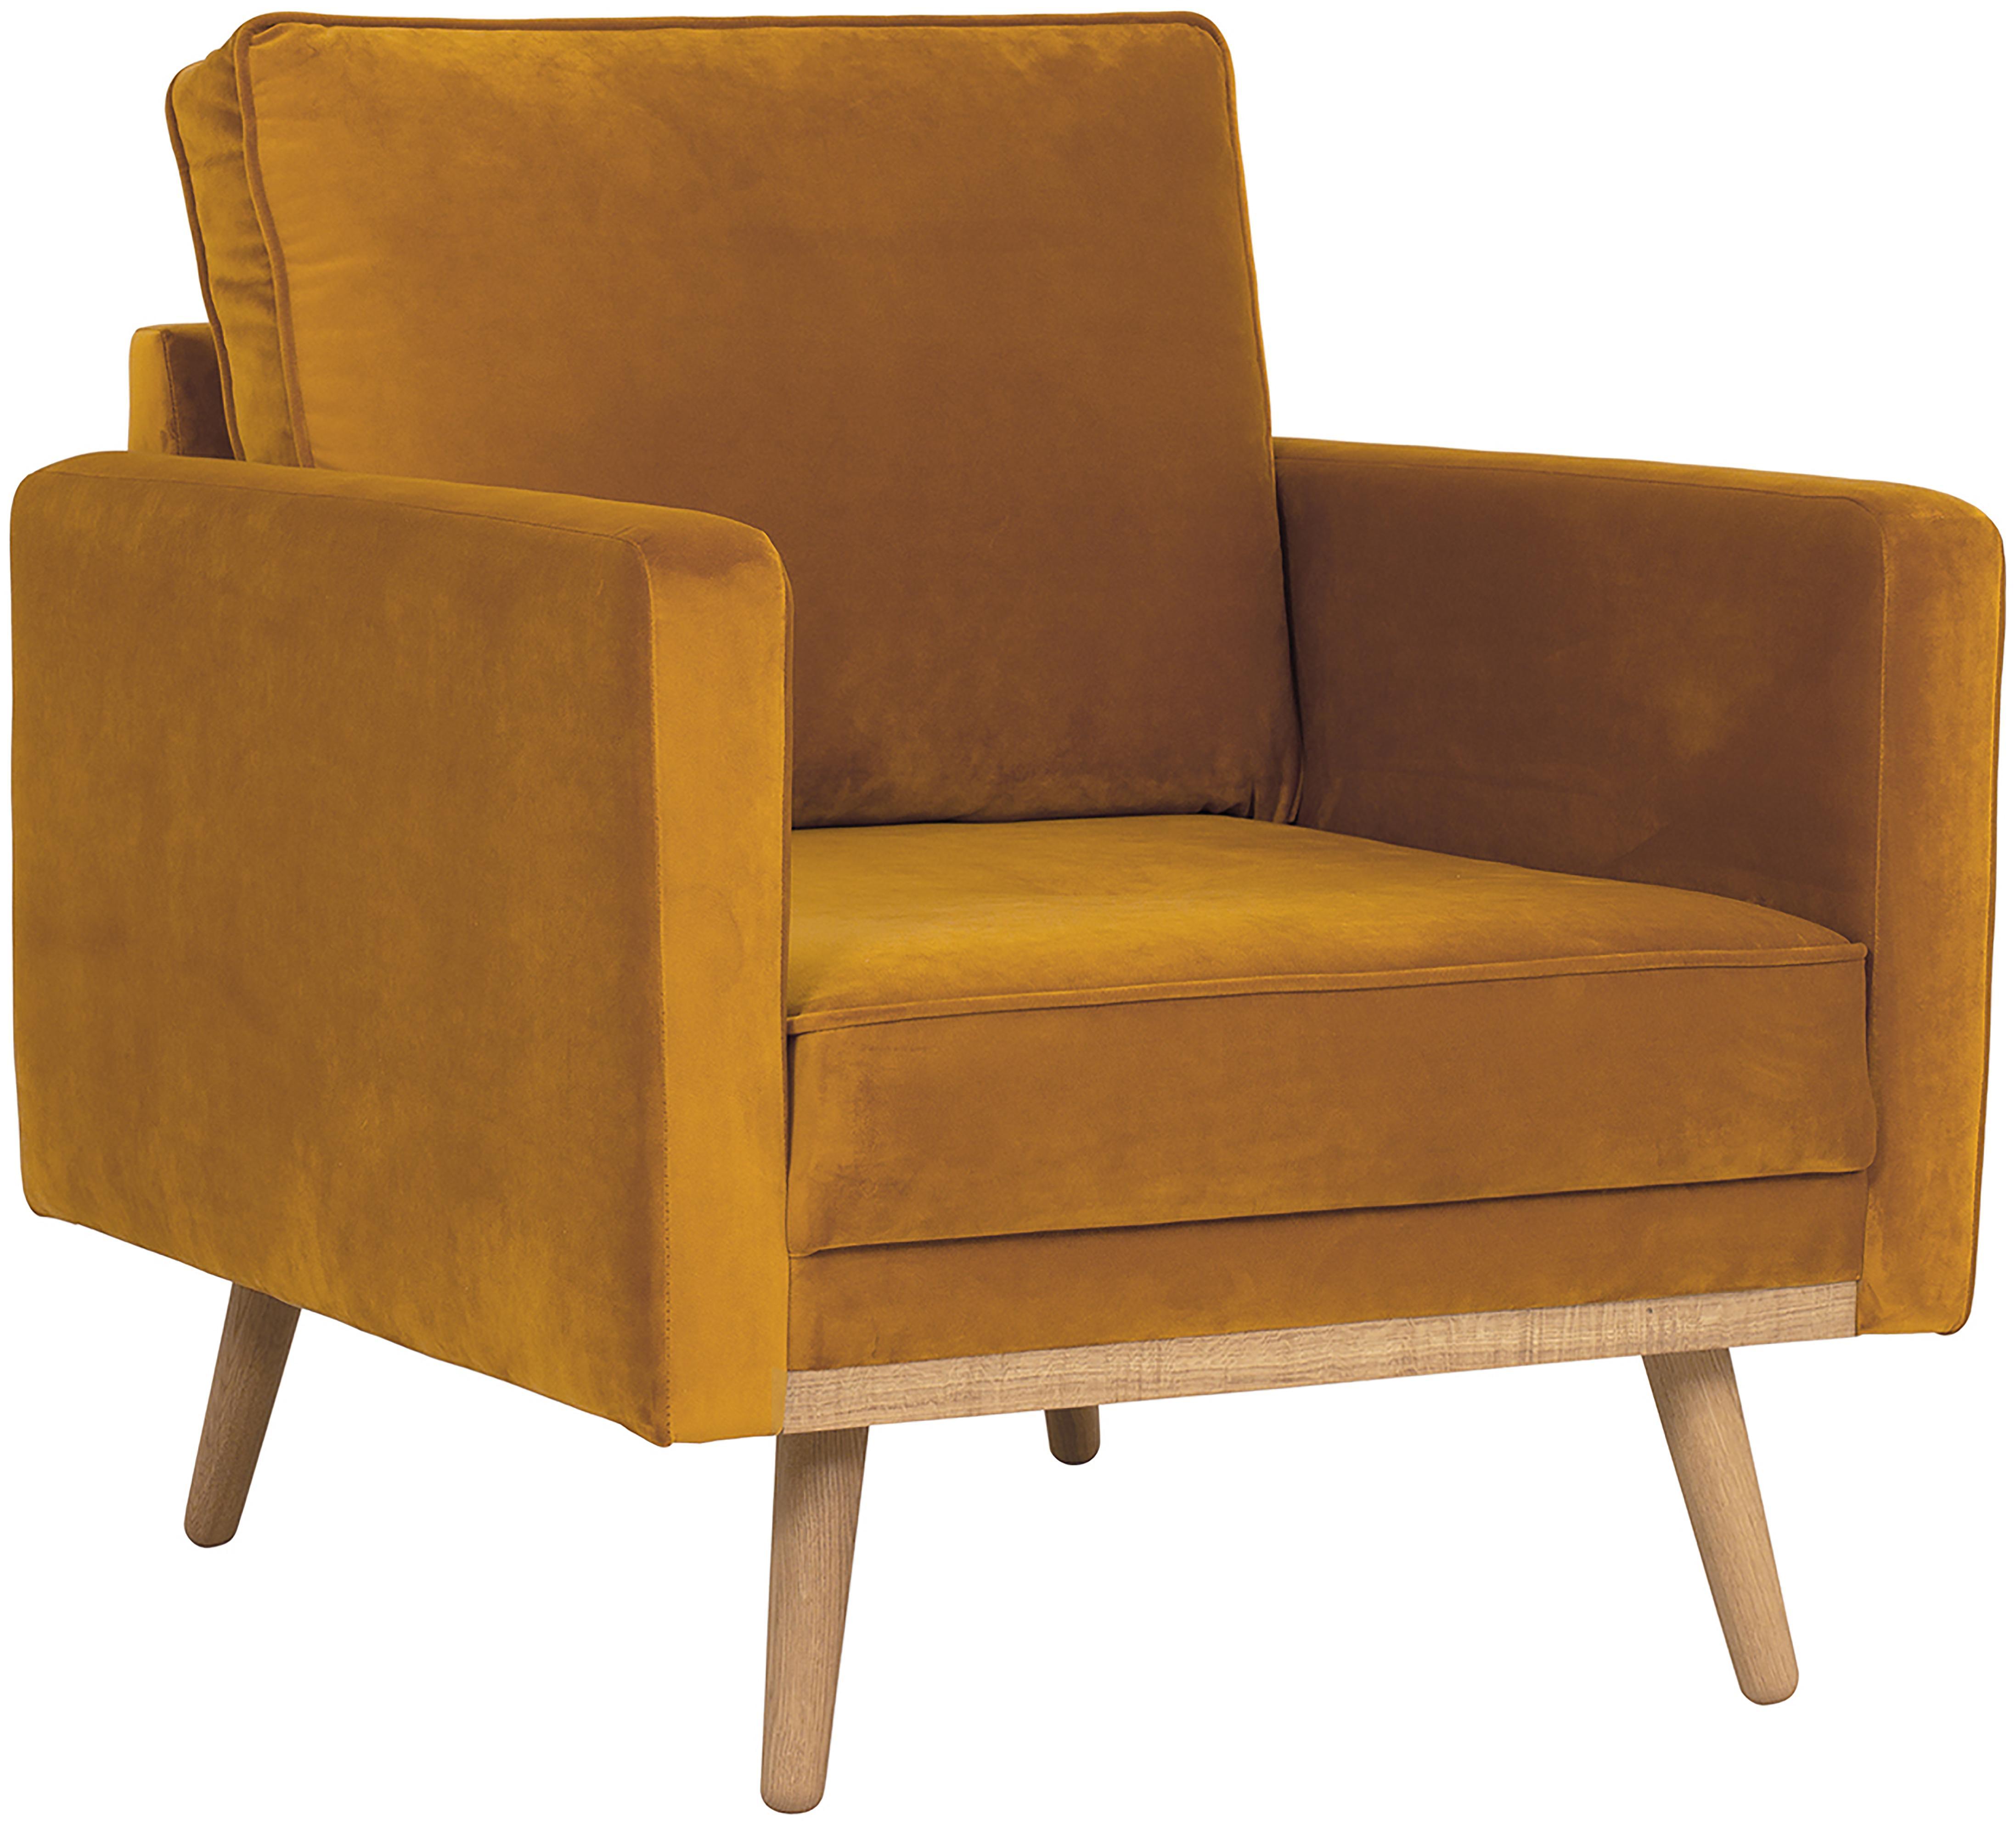 Fluwelen fauteuil Saint, Bekleding: fluweel (polyester), Frame: massief grenenhout, spaan, Fluweel mosterdgeel, B 85 x D 76 cm